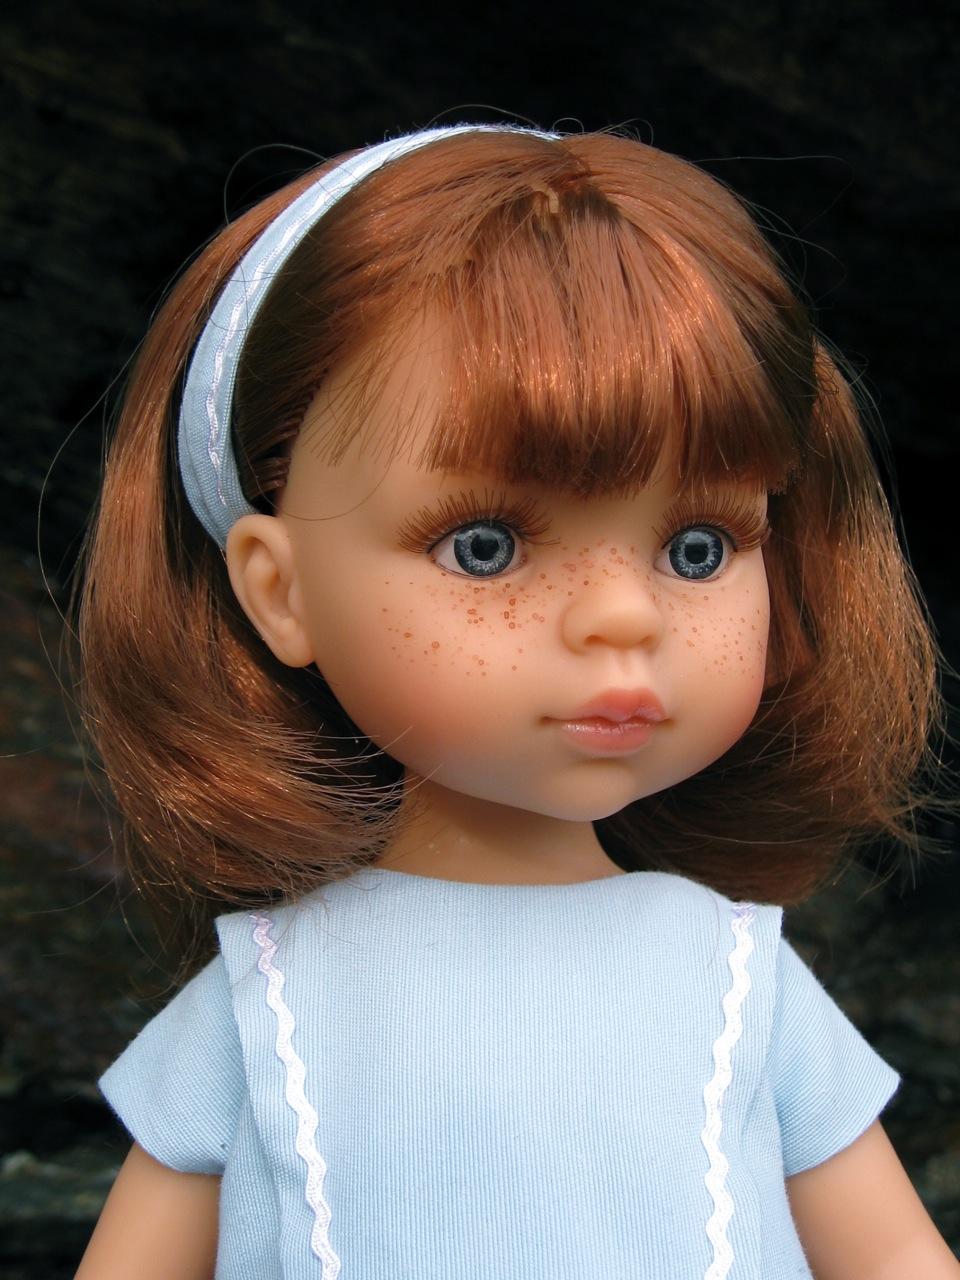 Ruth Treffeisen play doll Cristi Blue